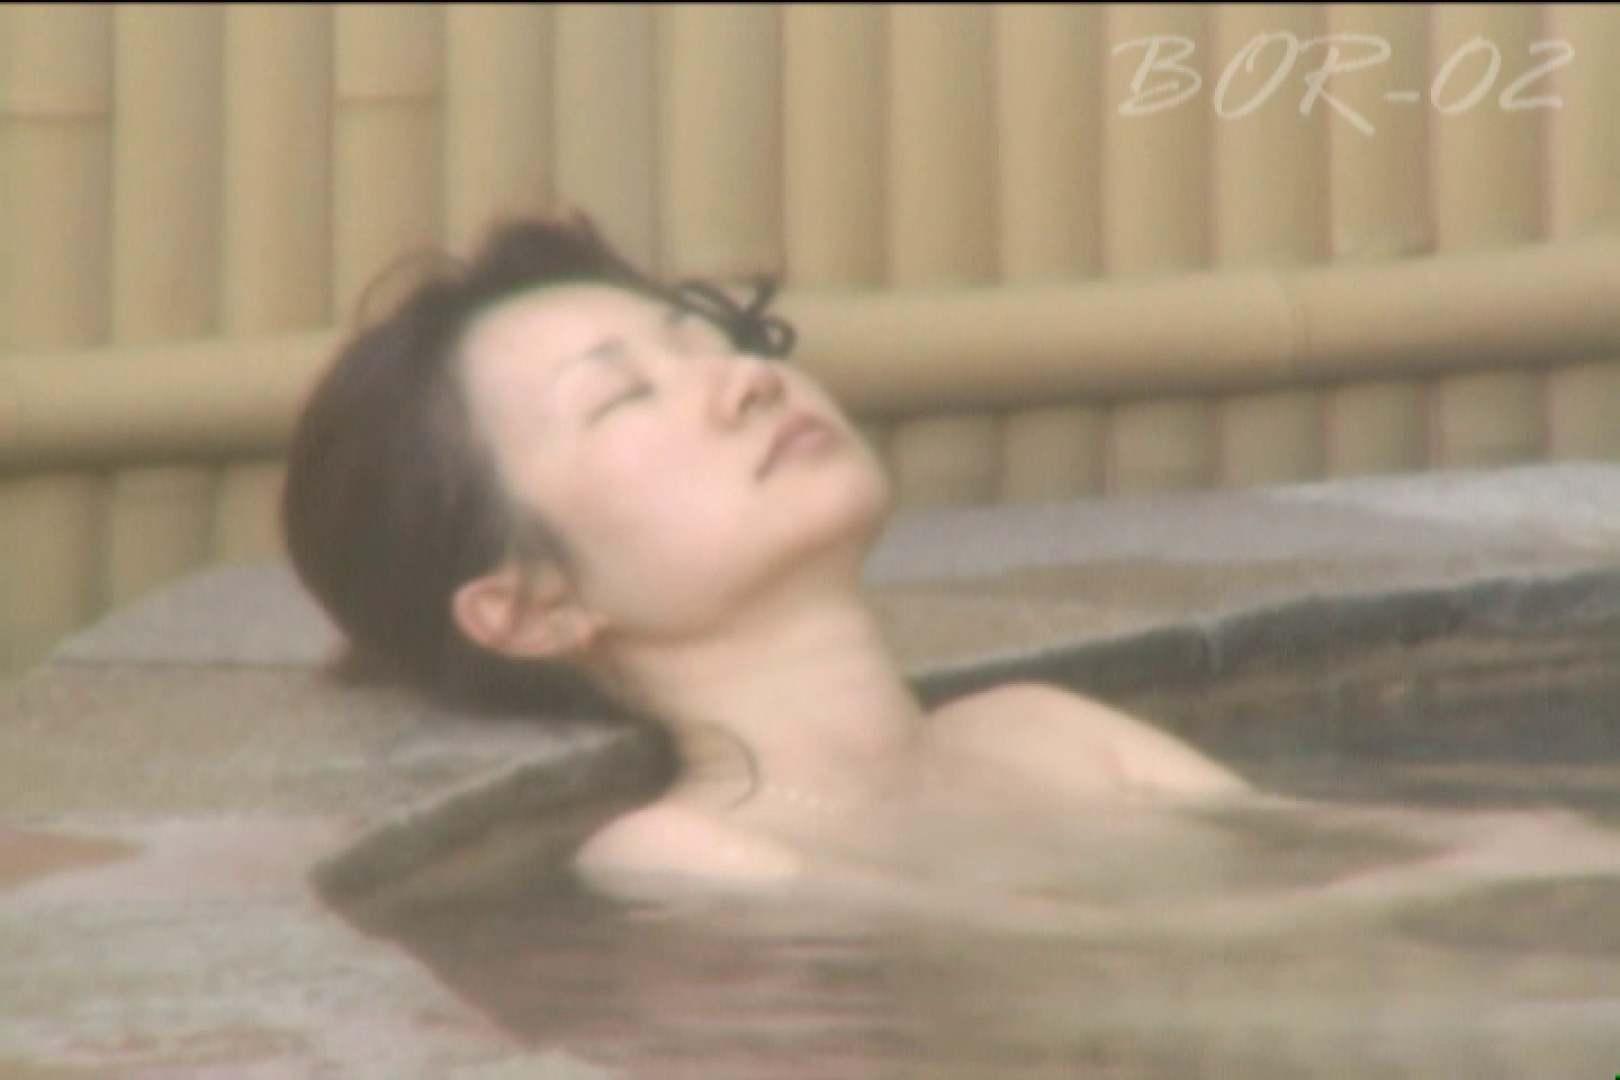 Aquaな露天風呂Vol.477 露天 アダルト動画キャプチャ 99PICs 47